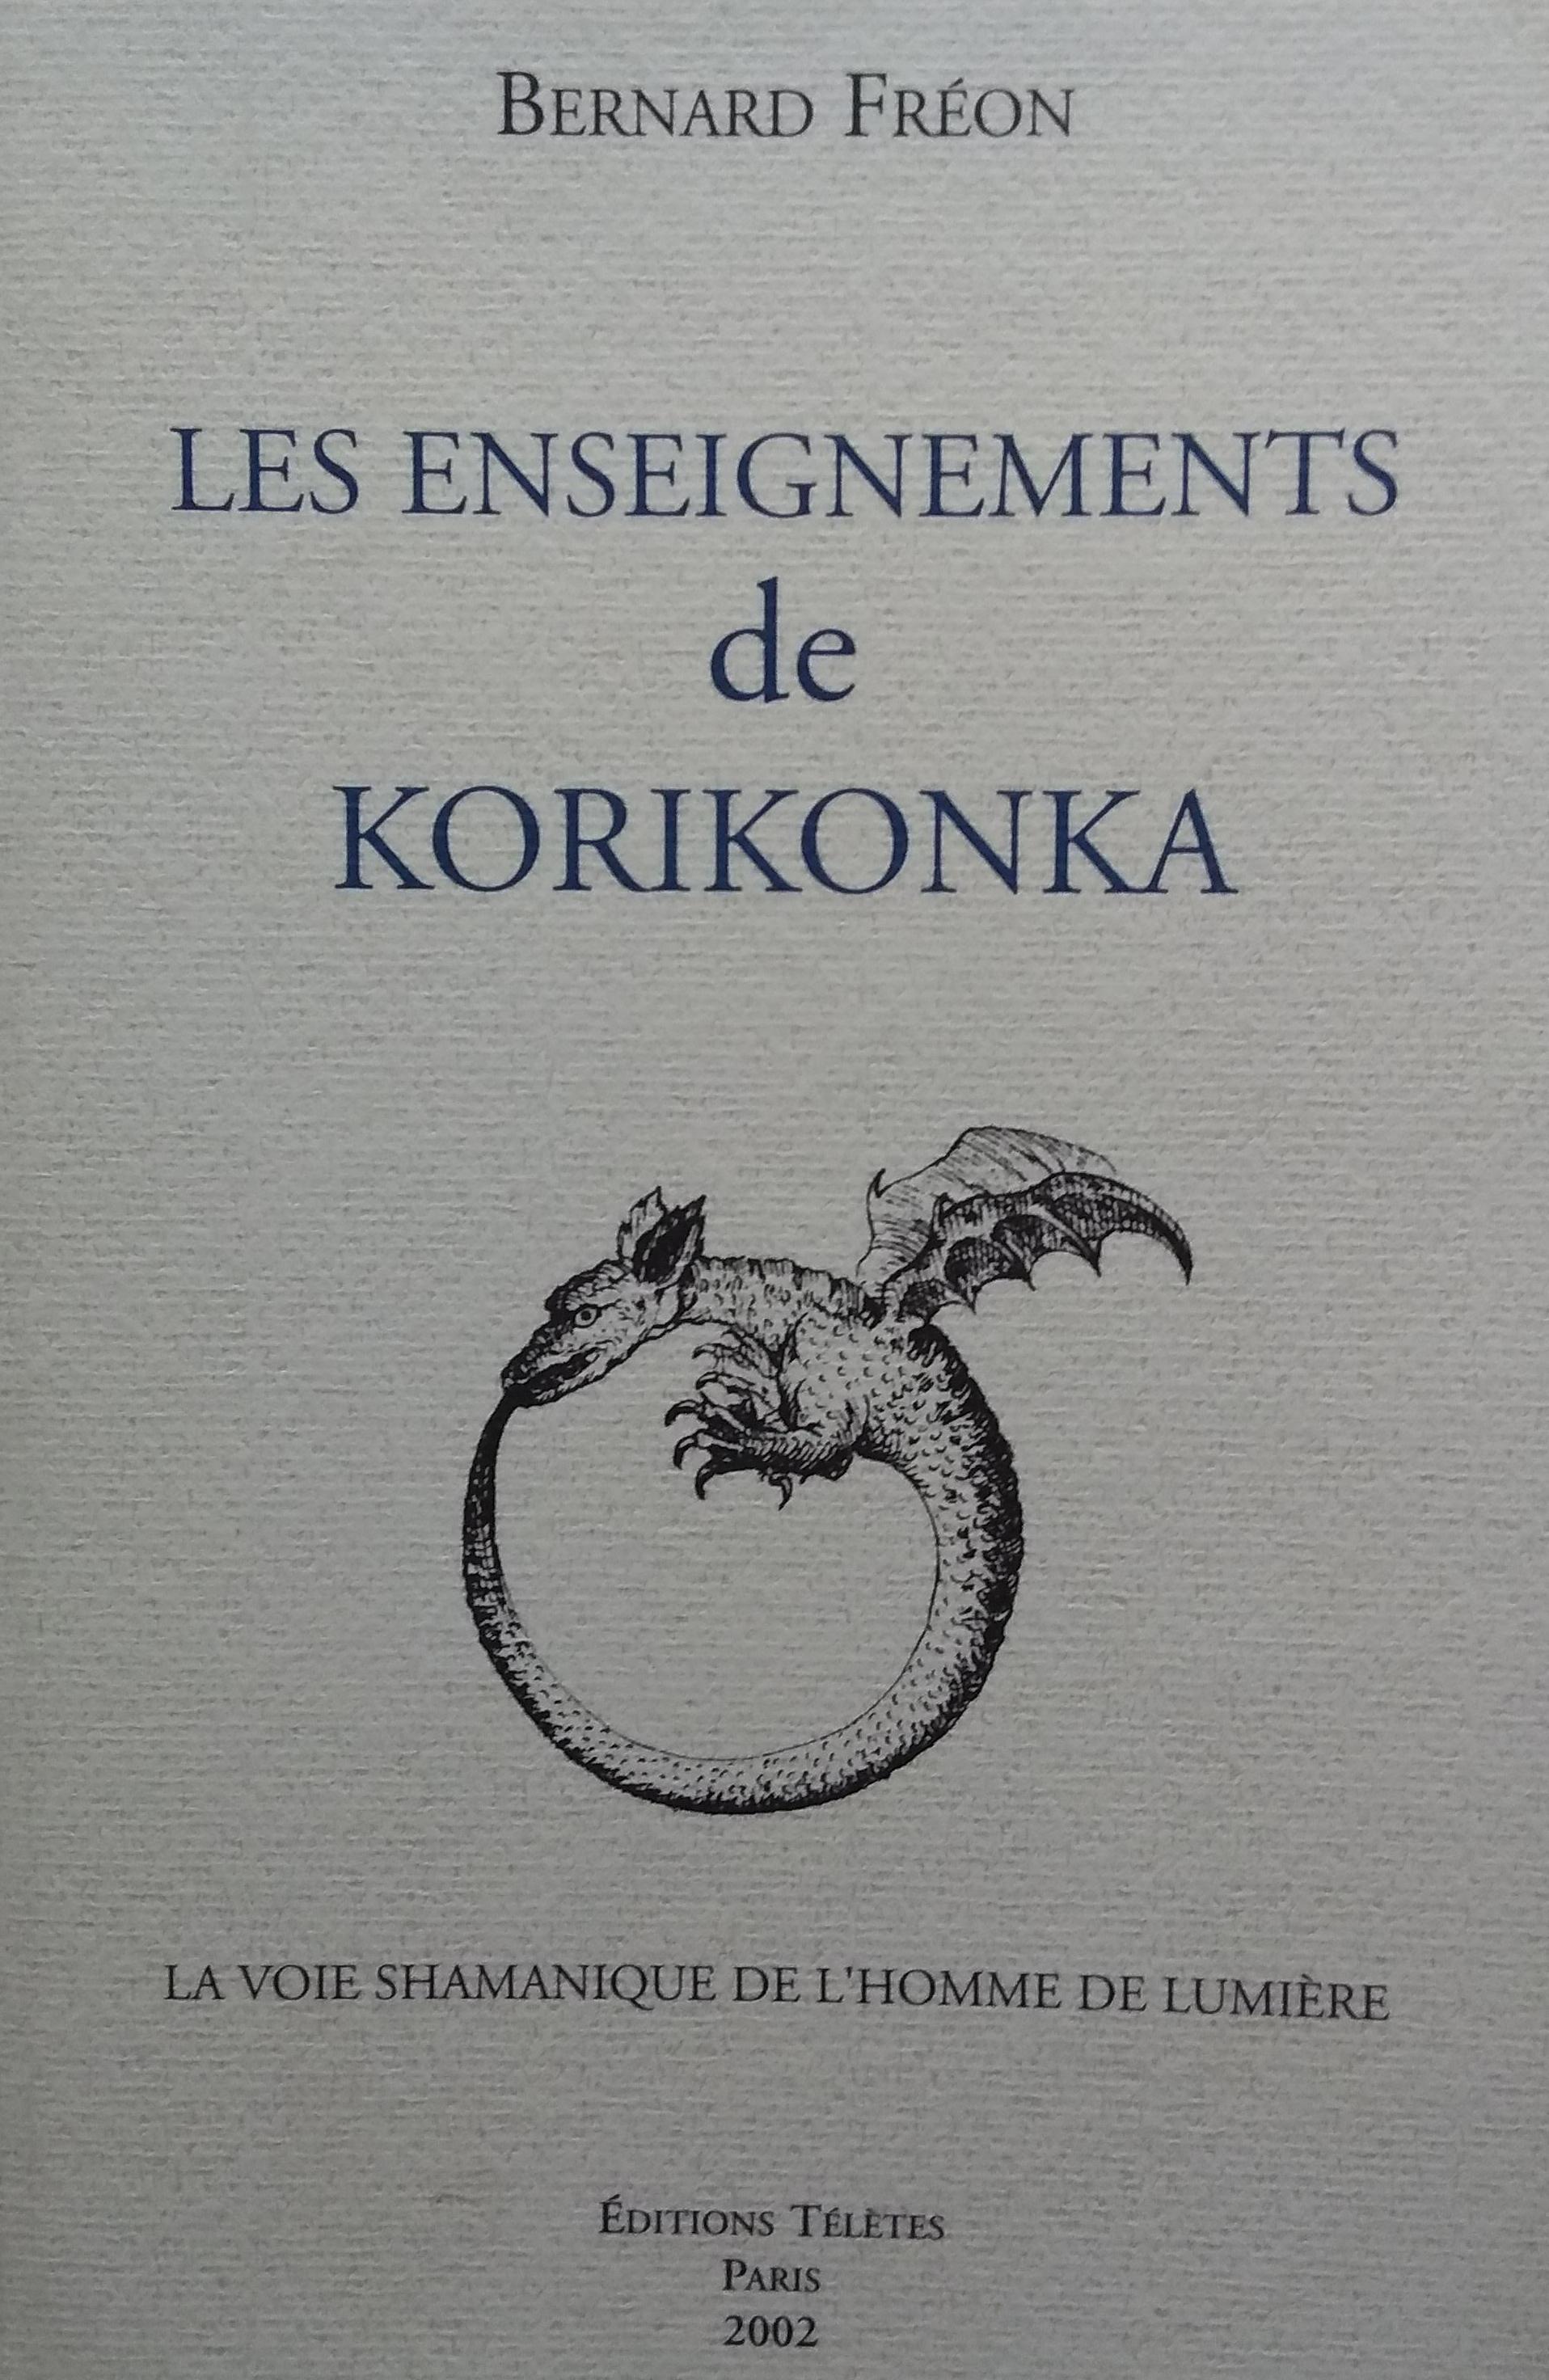 Les Enseigements de Korikonka